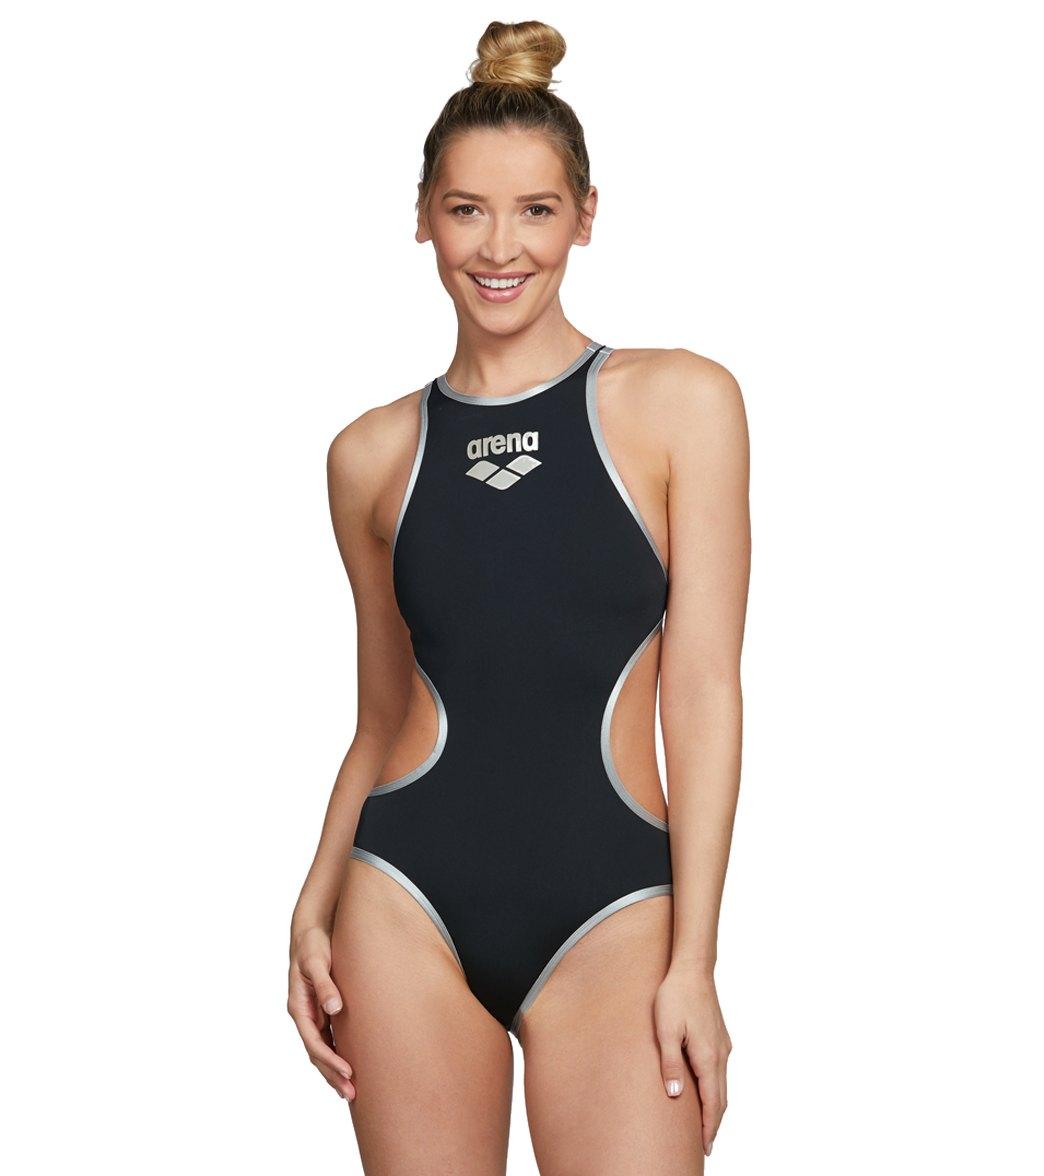 Arena Women's One Big Logo Piece Swimsuit